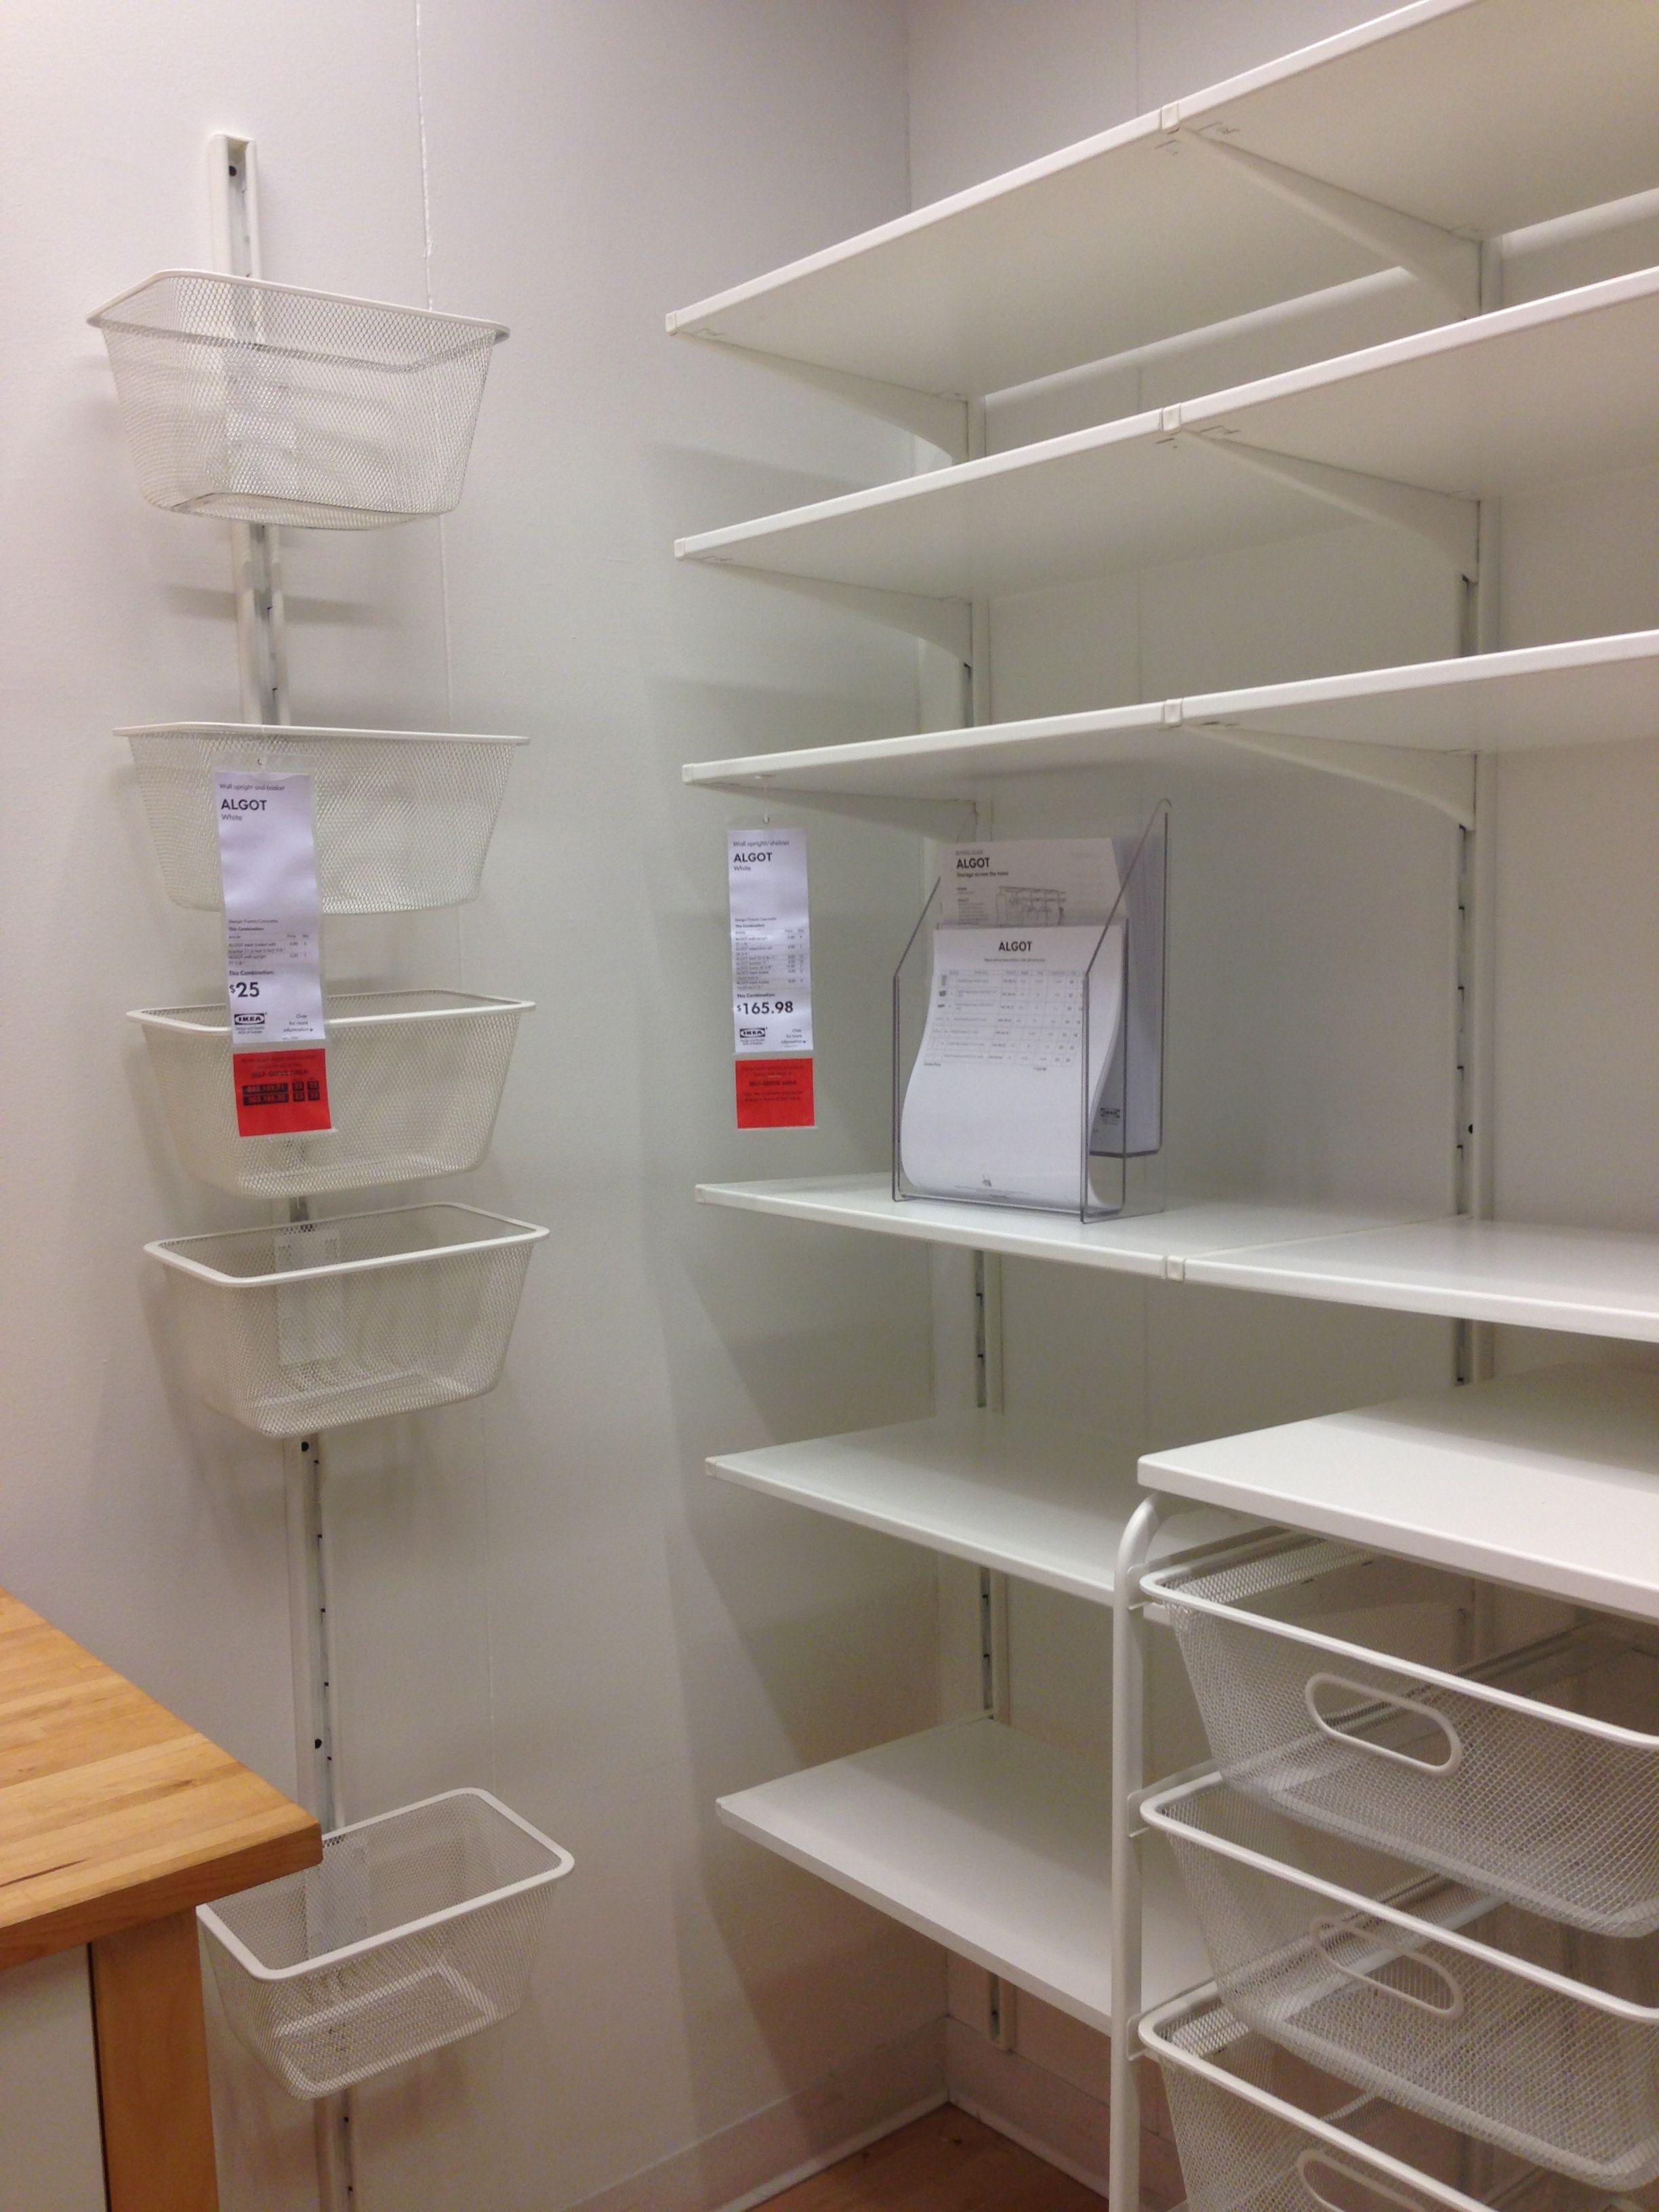 algot pantry organization storage ikea pinterest pantry organisation pantry and organizations. Black Bedroom Furniture Sets. Home Design Ideas